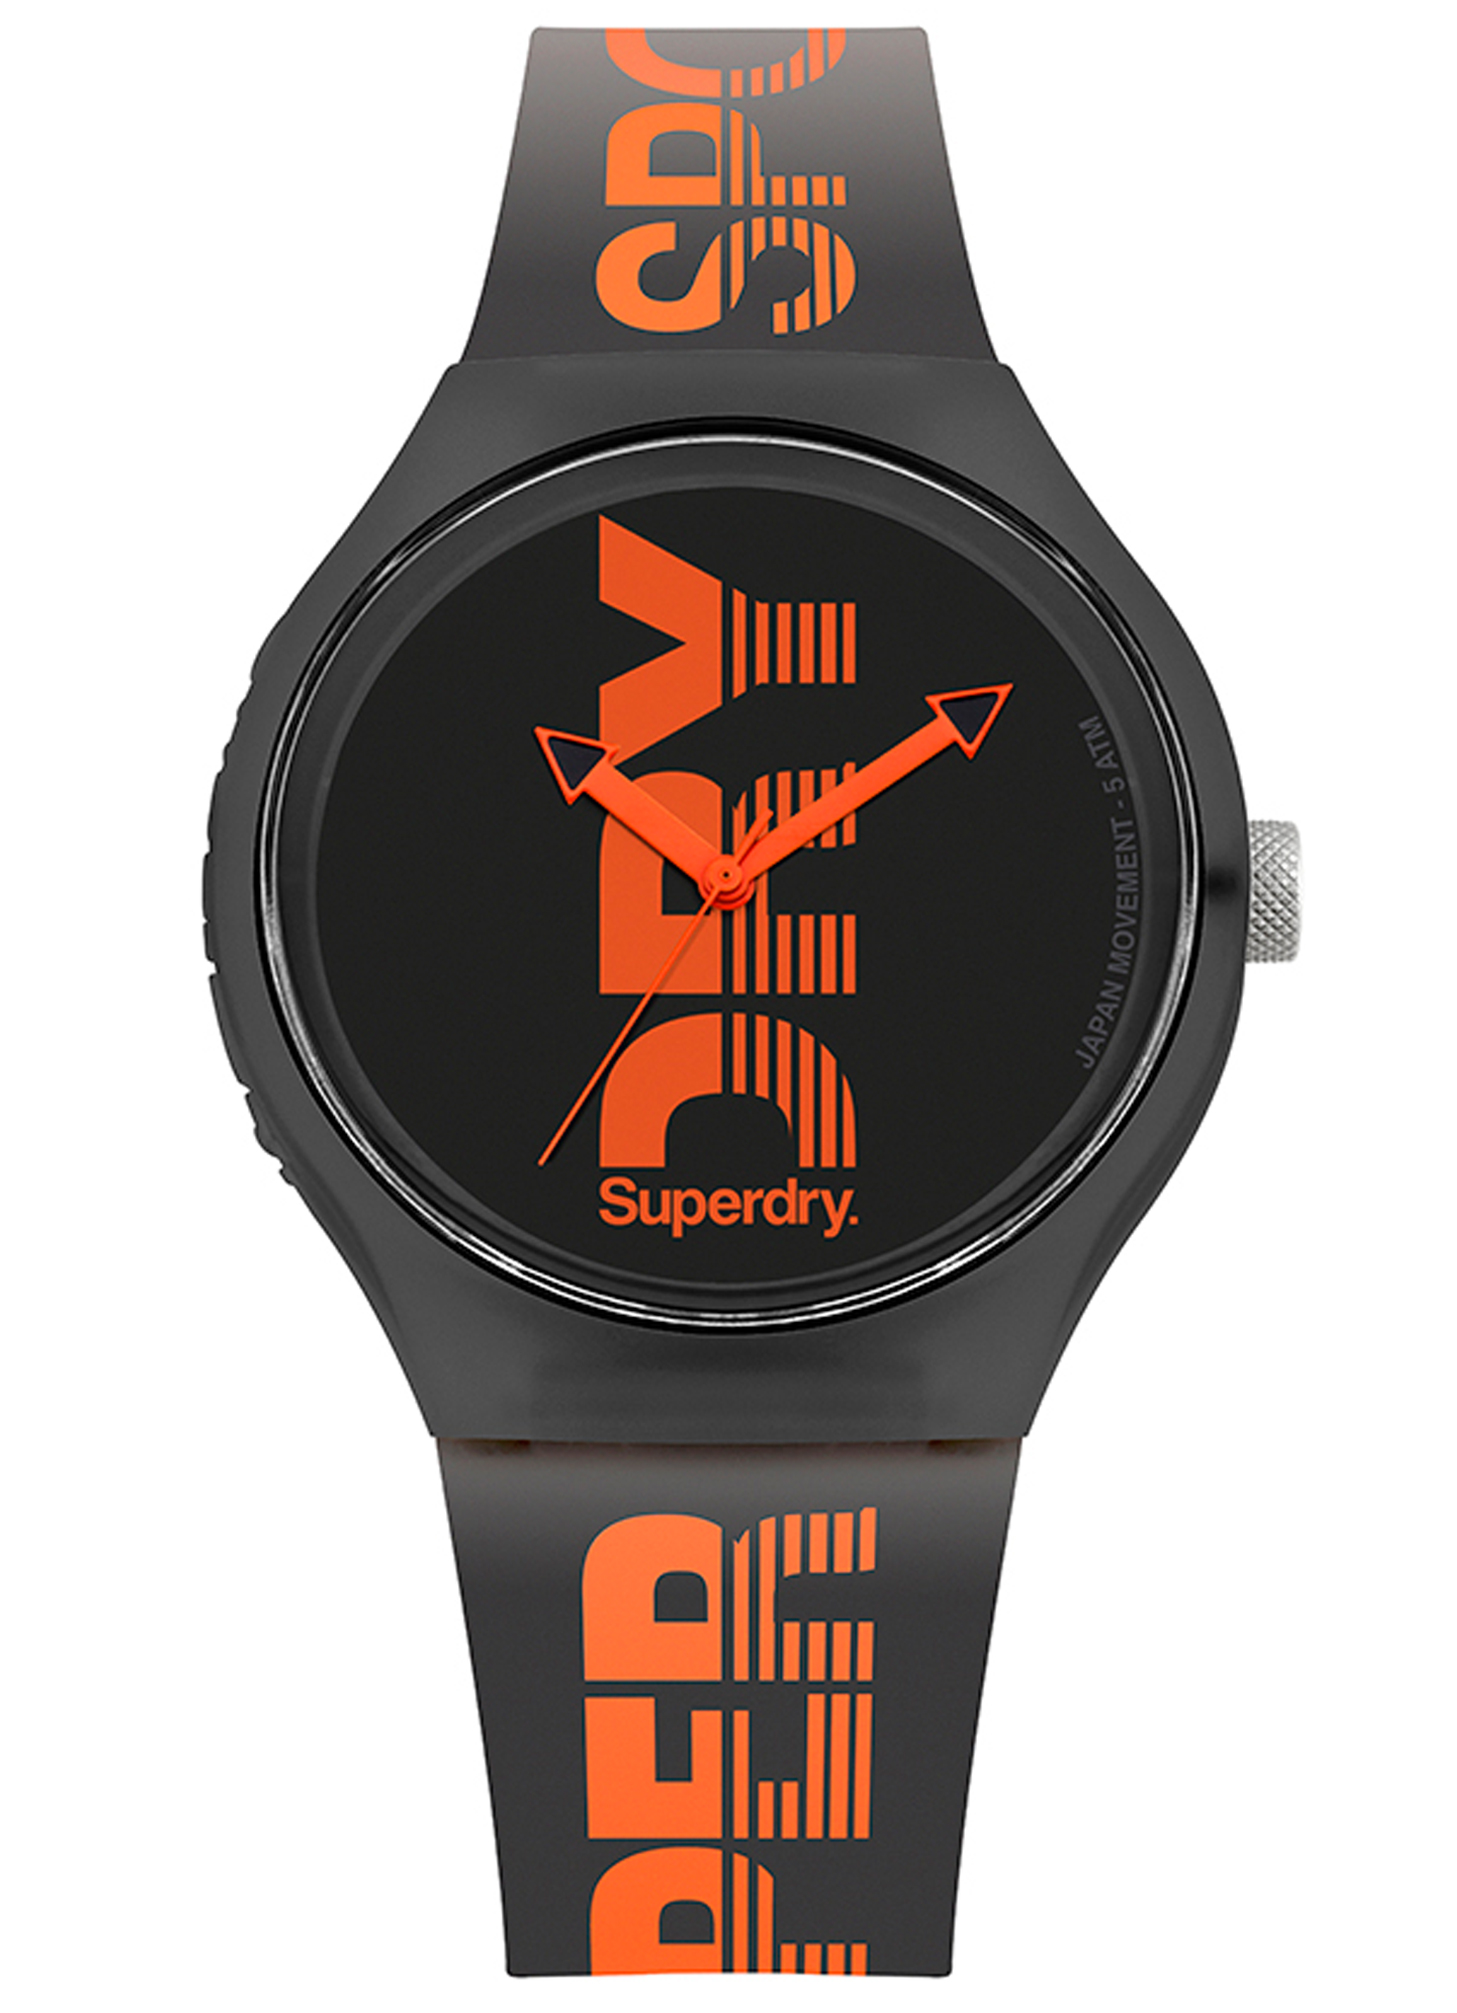 superdry_watches_SDSYG189BO.jpg